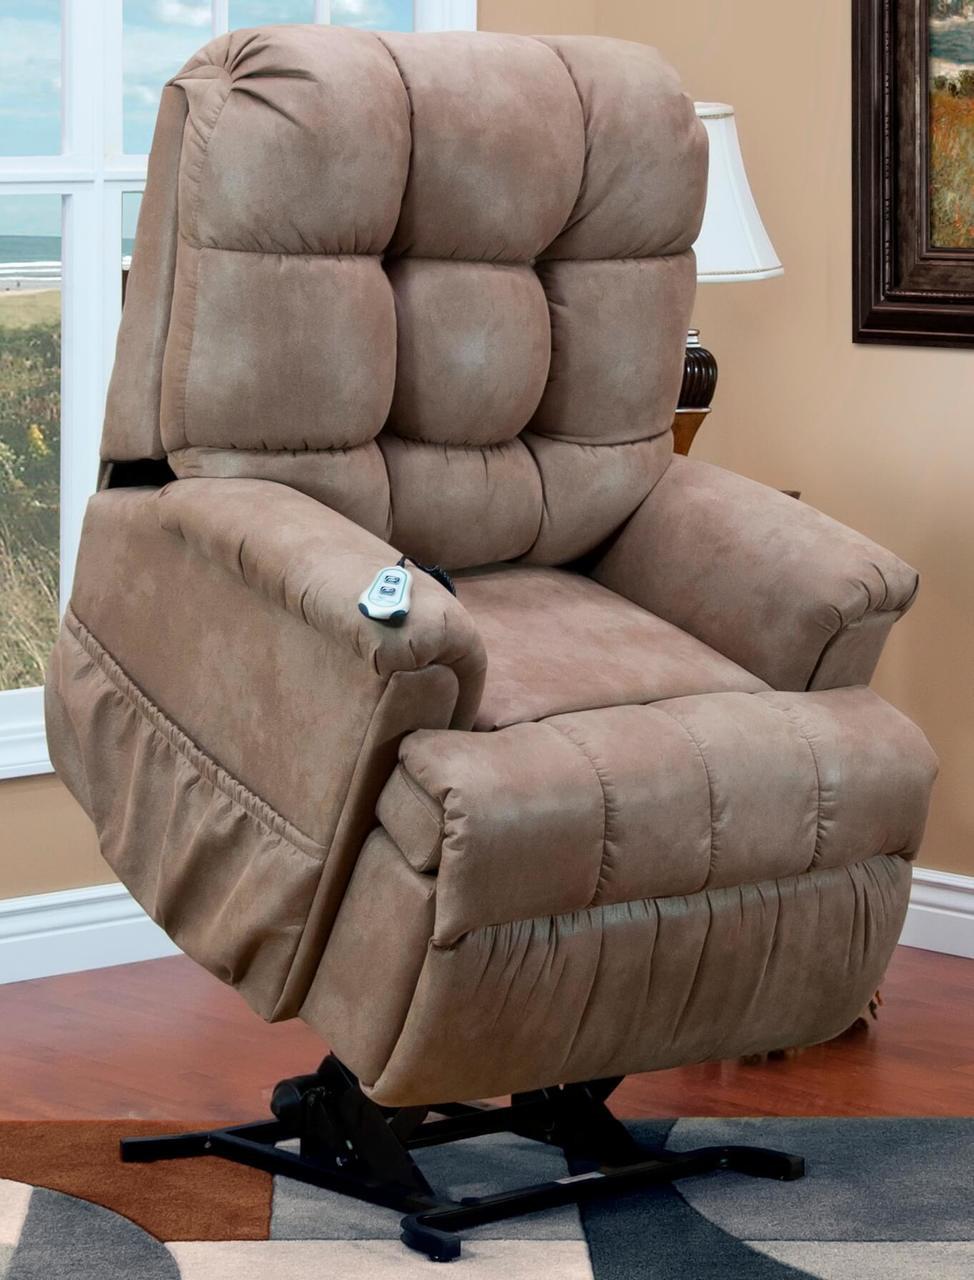 Surprising 5555 Full Sleeper Infinite Position Reclining Lift Chair By Med Lift Frankydiablos Diy Chair Ideas Frankydiabloscom